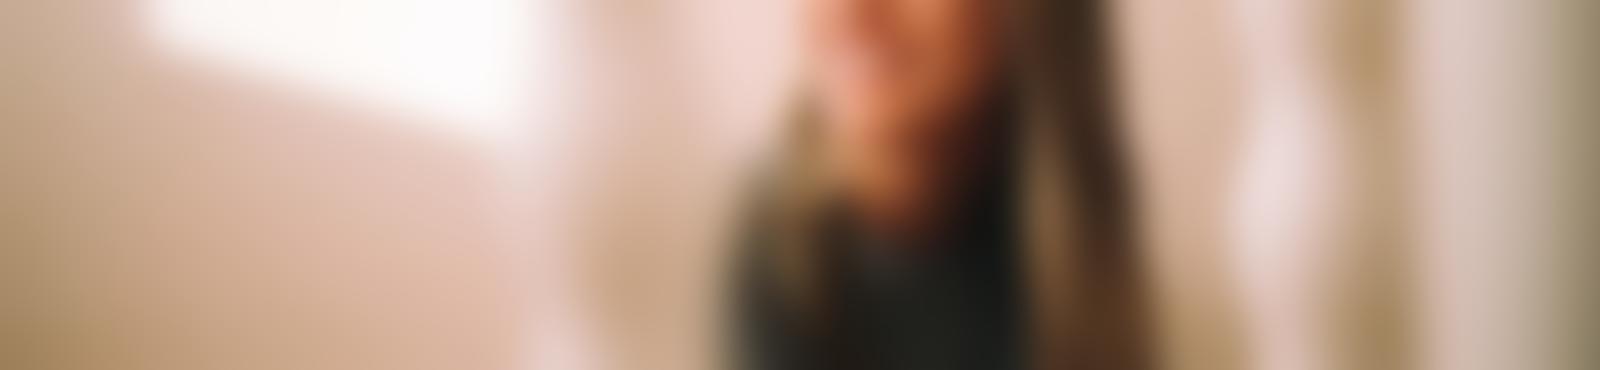 Blurred 3dee4351 433d 40f7 8353 838e7f604c2d